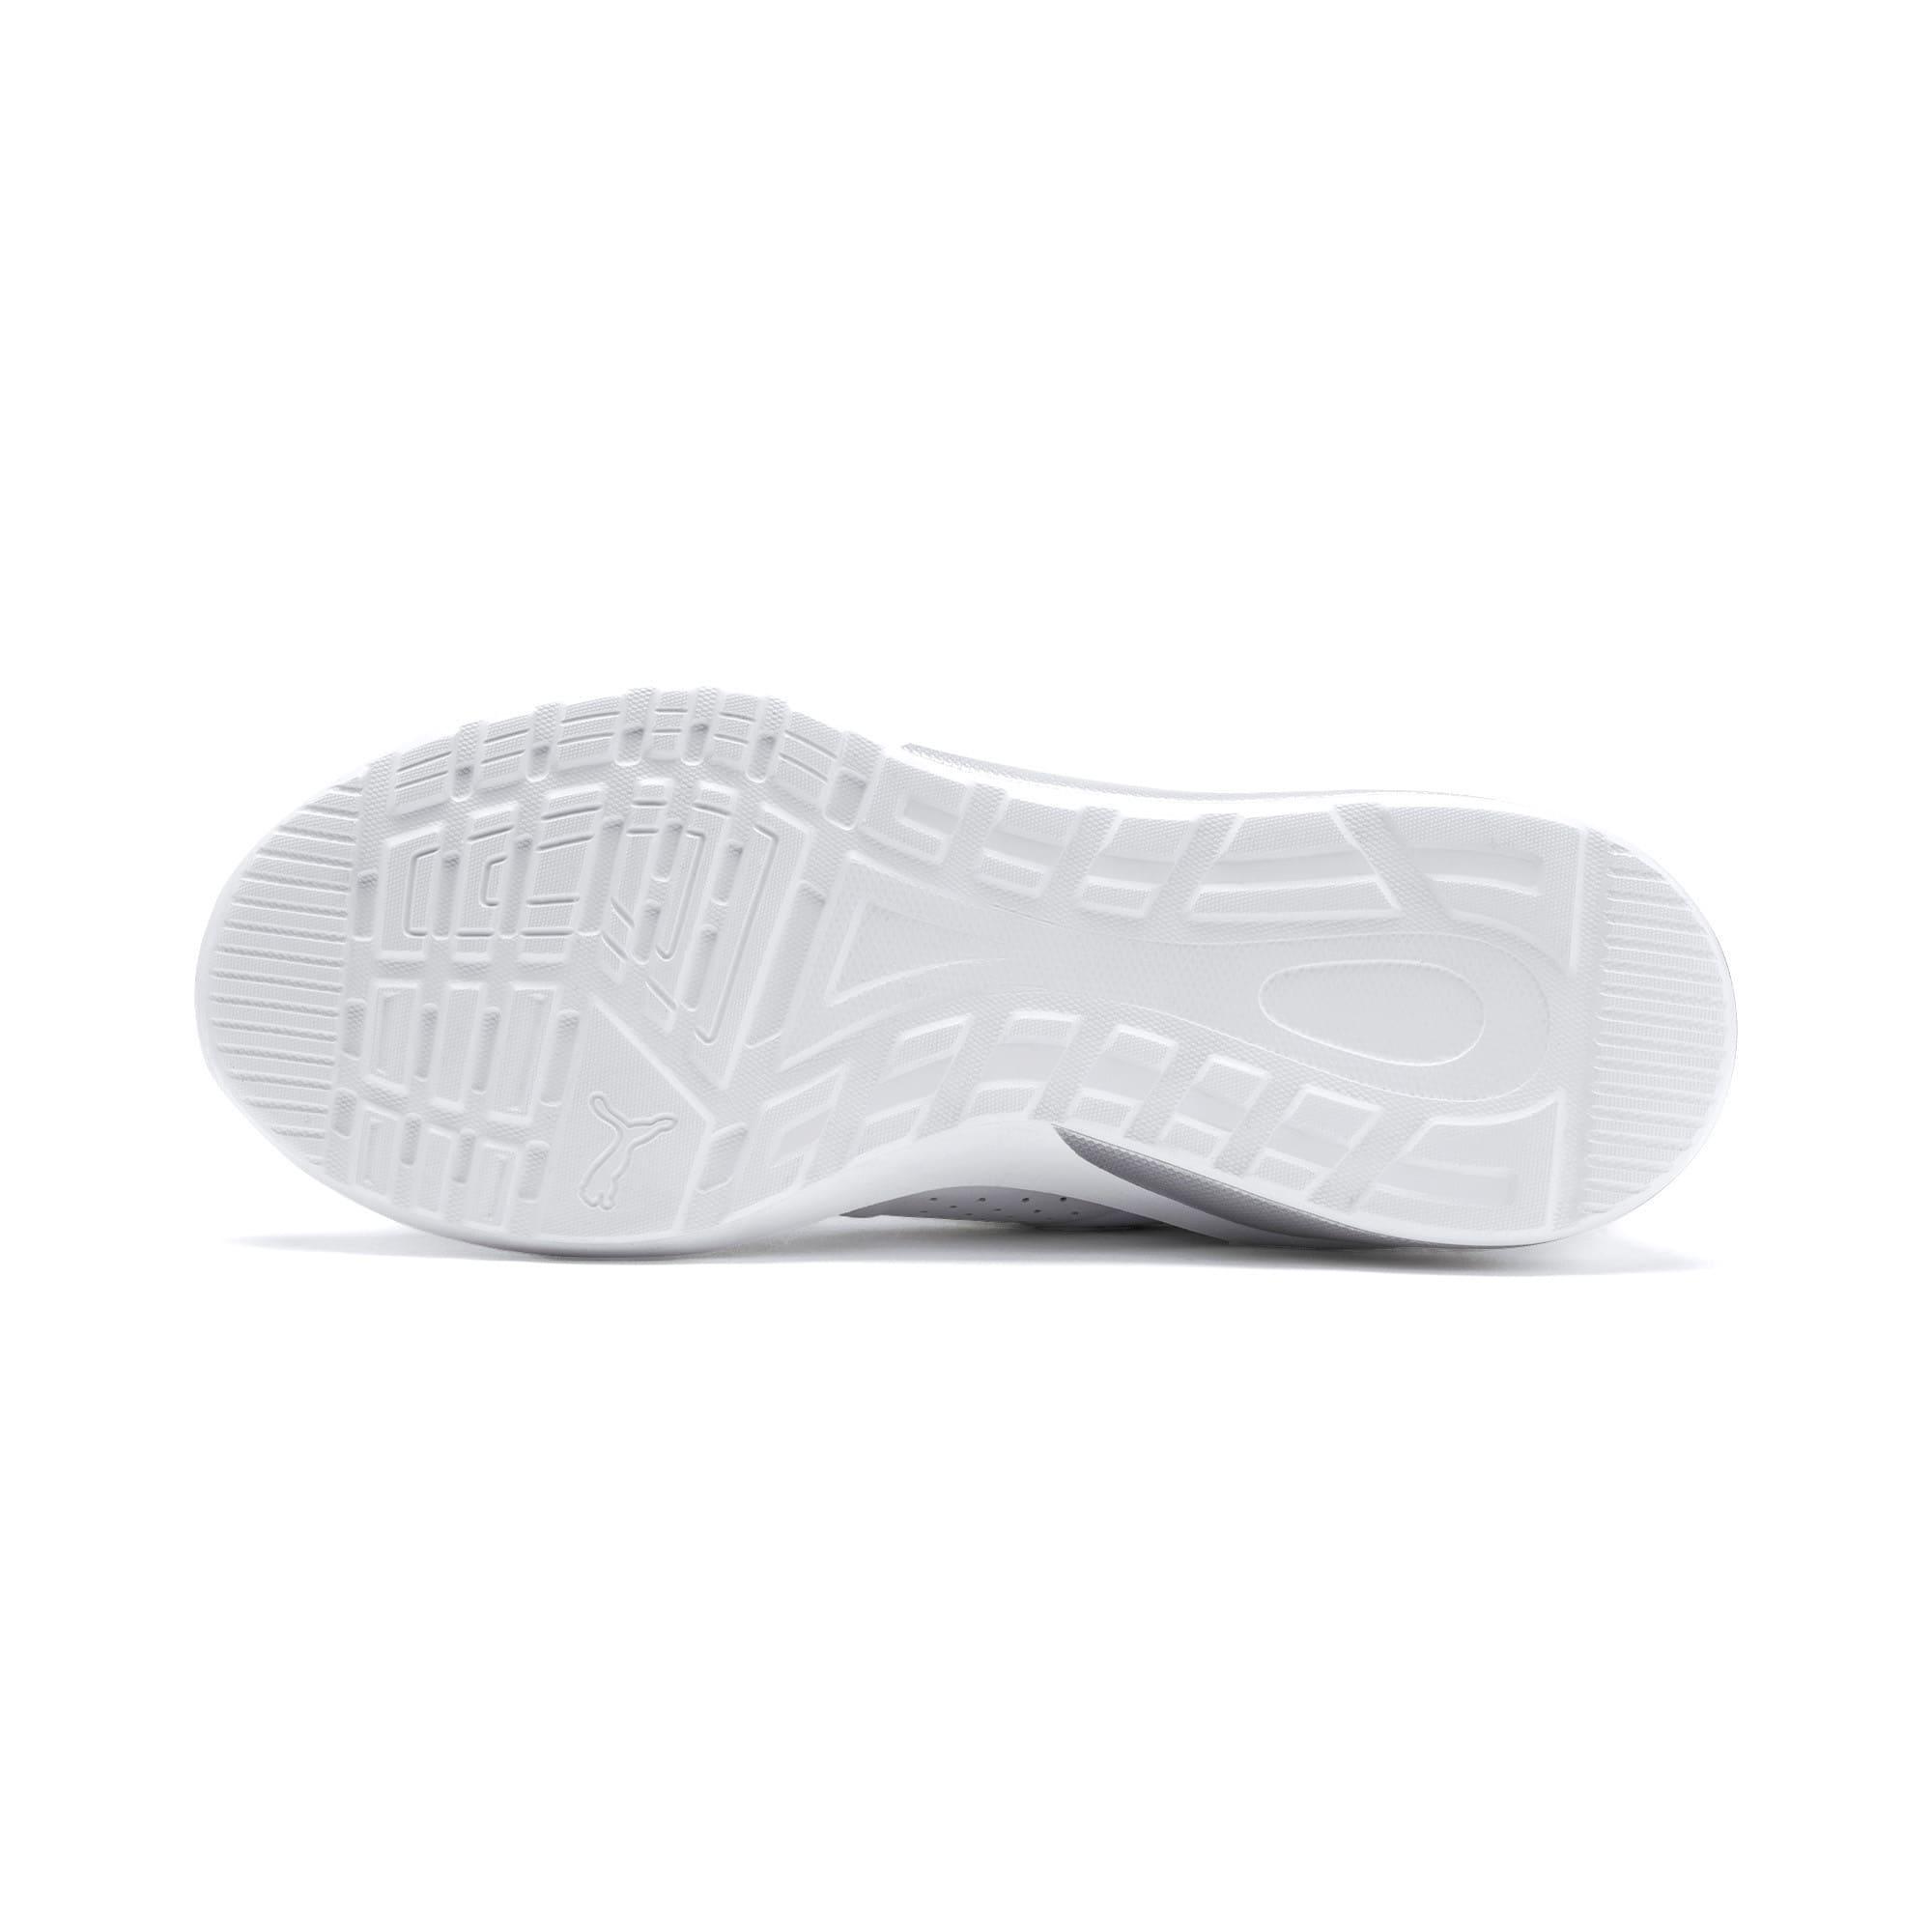 Thumbnail 7 of Emergence Lights Men's Running Shoes, Puma White-Puma Silver, medium-IND